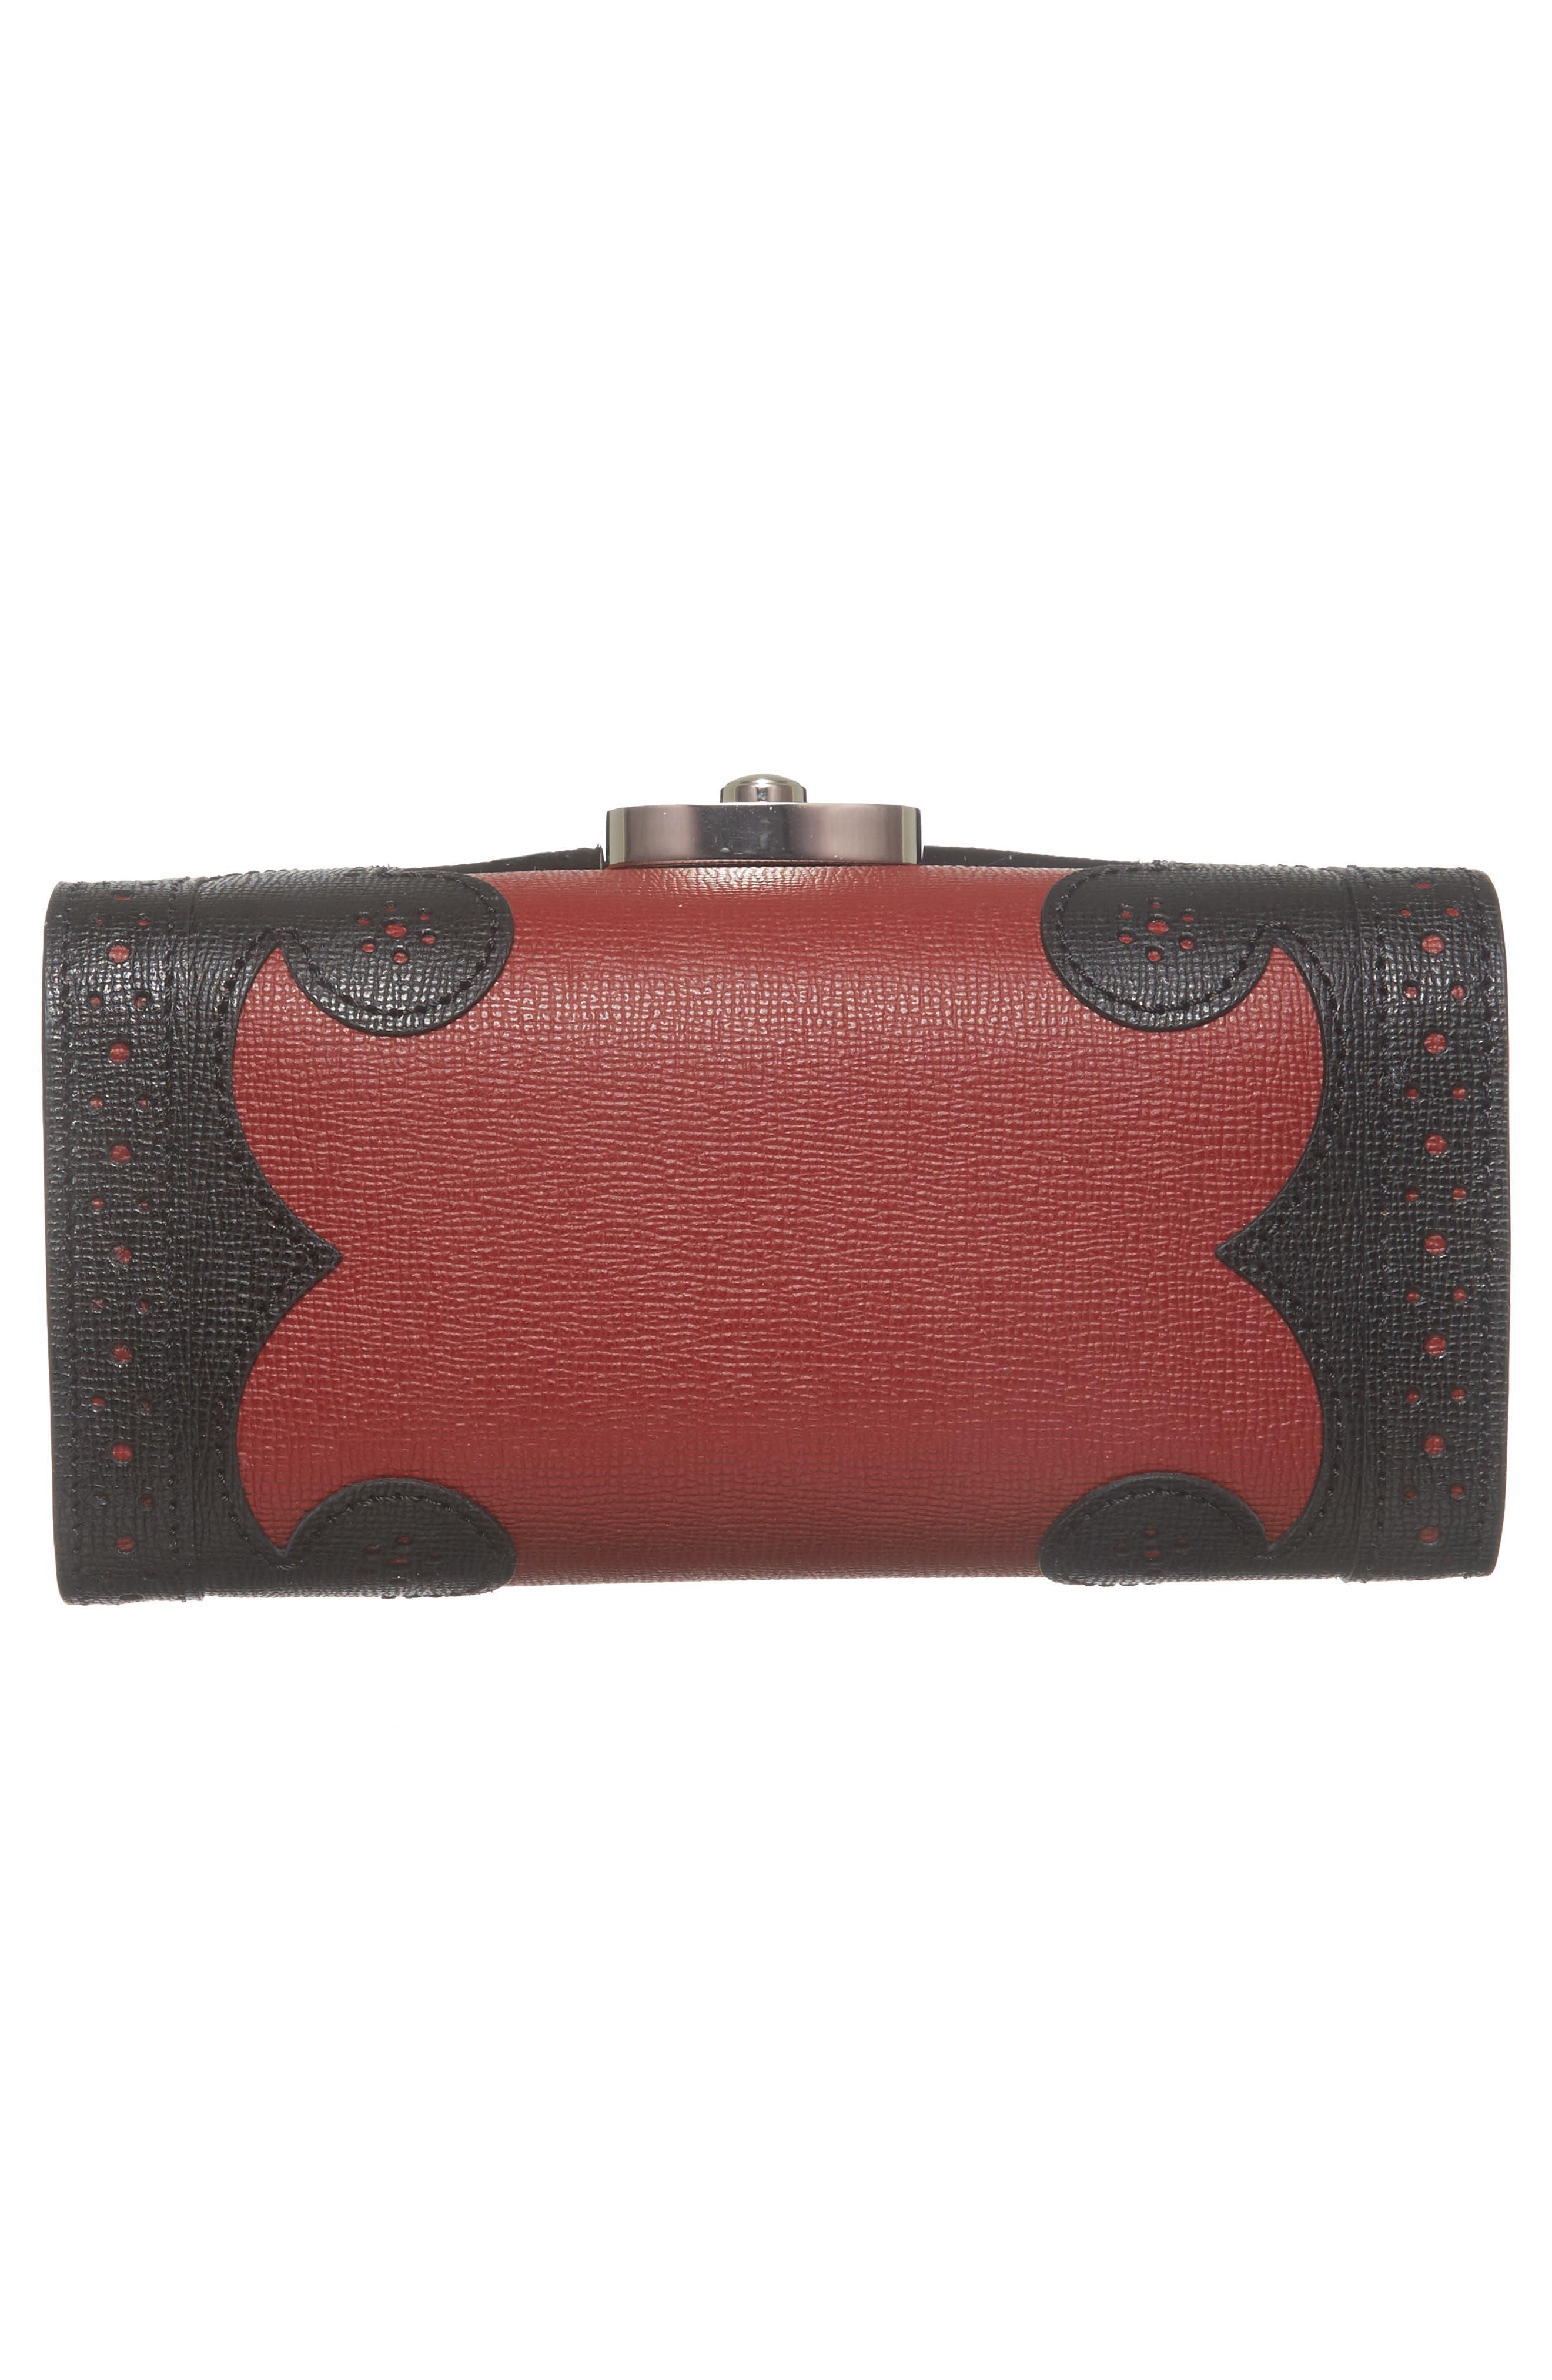 LONGCHAMP,                             Effrontée Leather Crossbody Bag,                             Alternate thumbnail 6, color,                             618